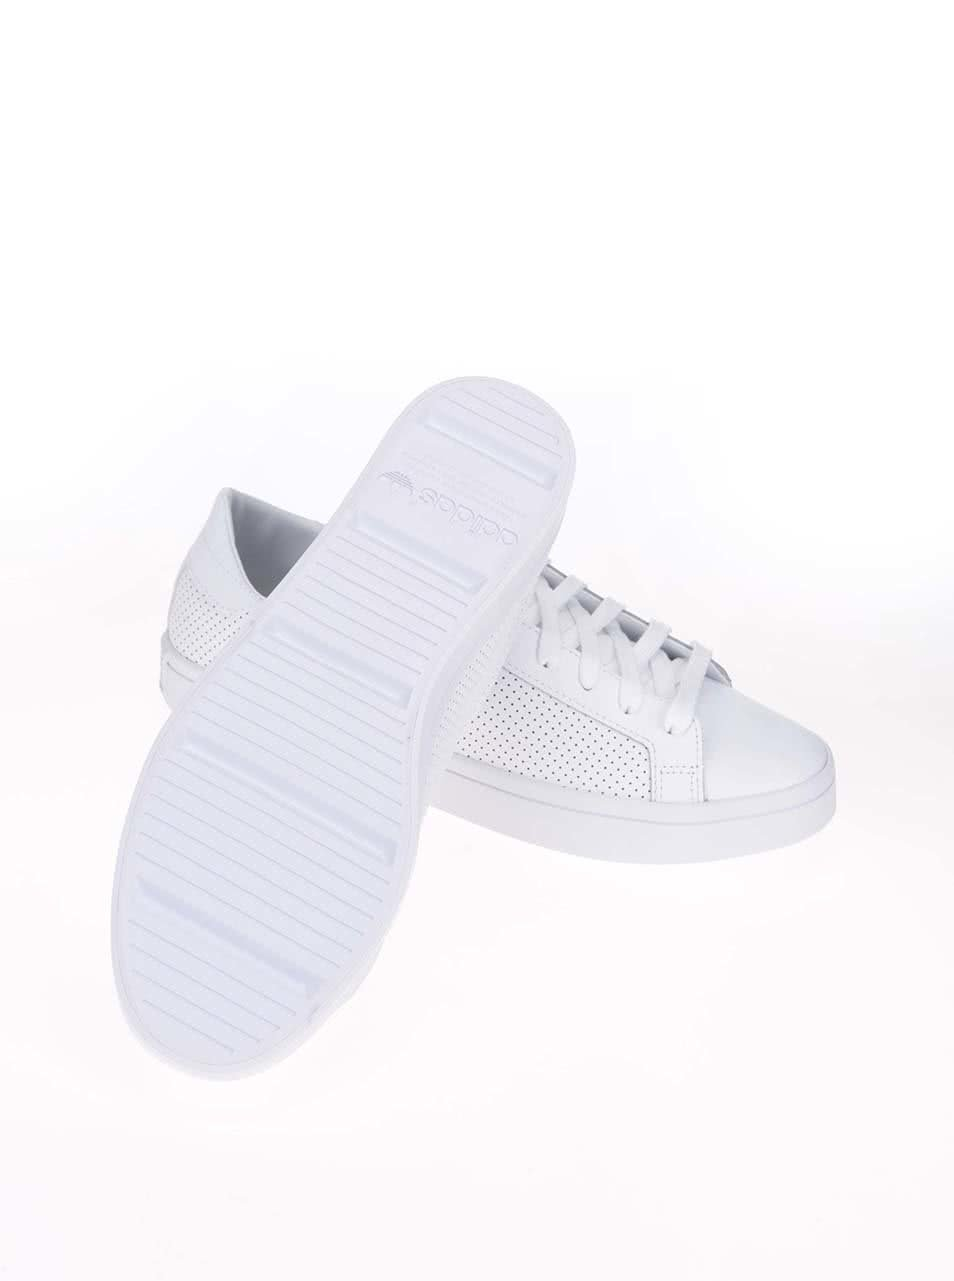 Biele pánske kožené tenisky adidas Originals Court Vantage ... f430061ecbe